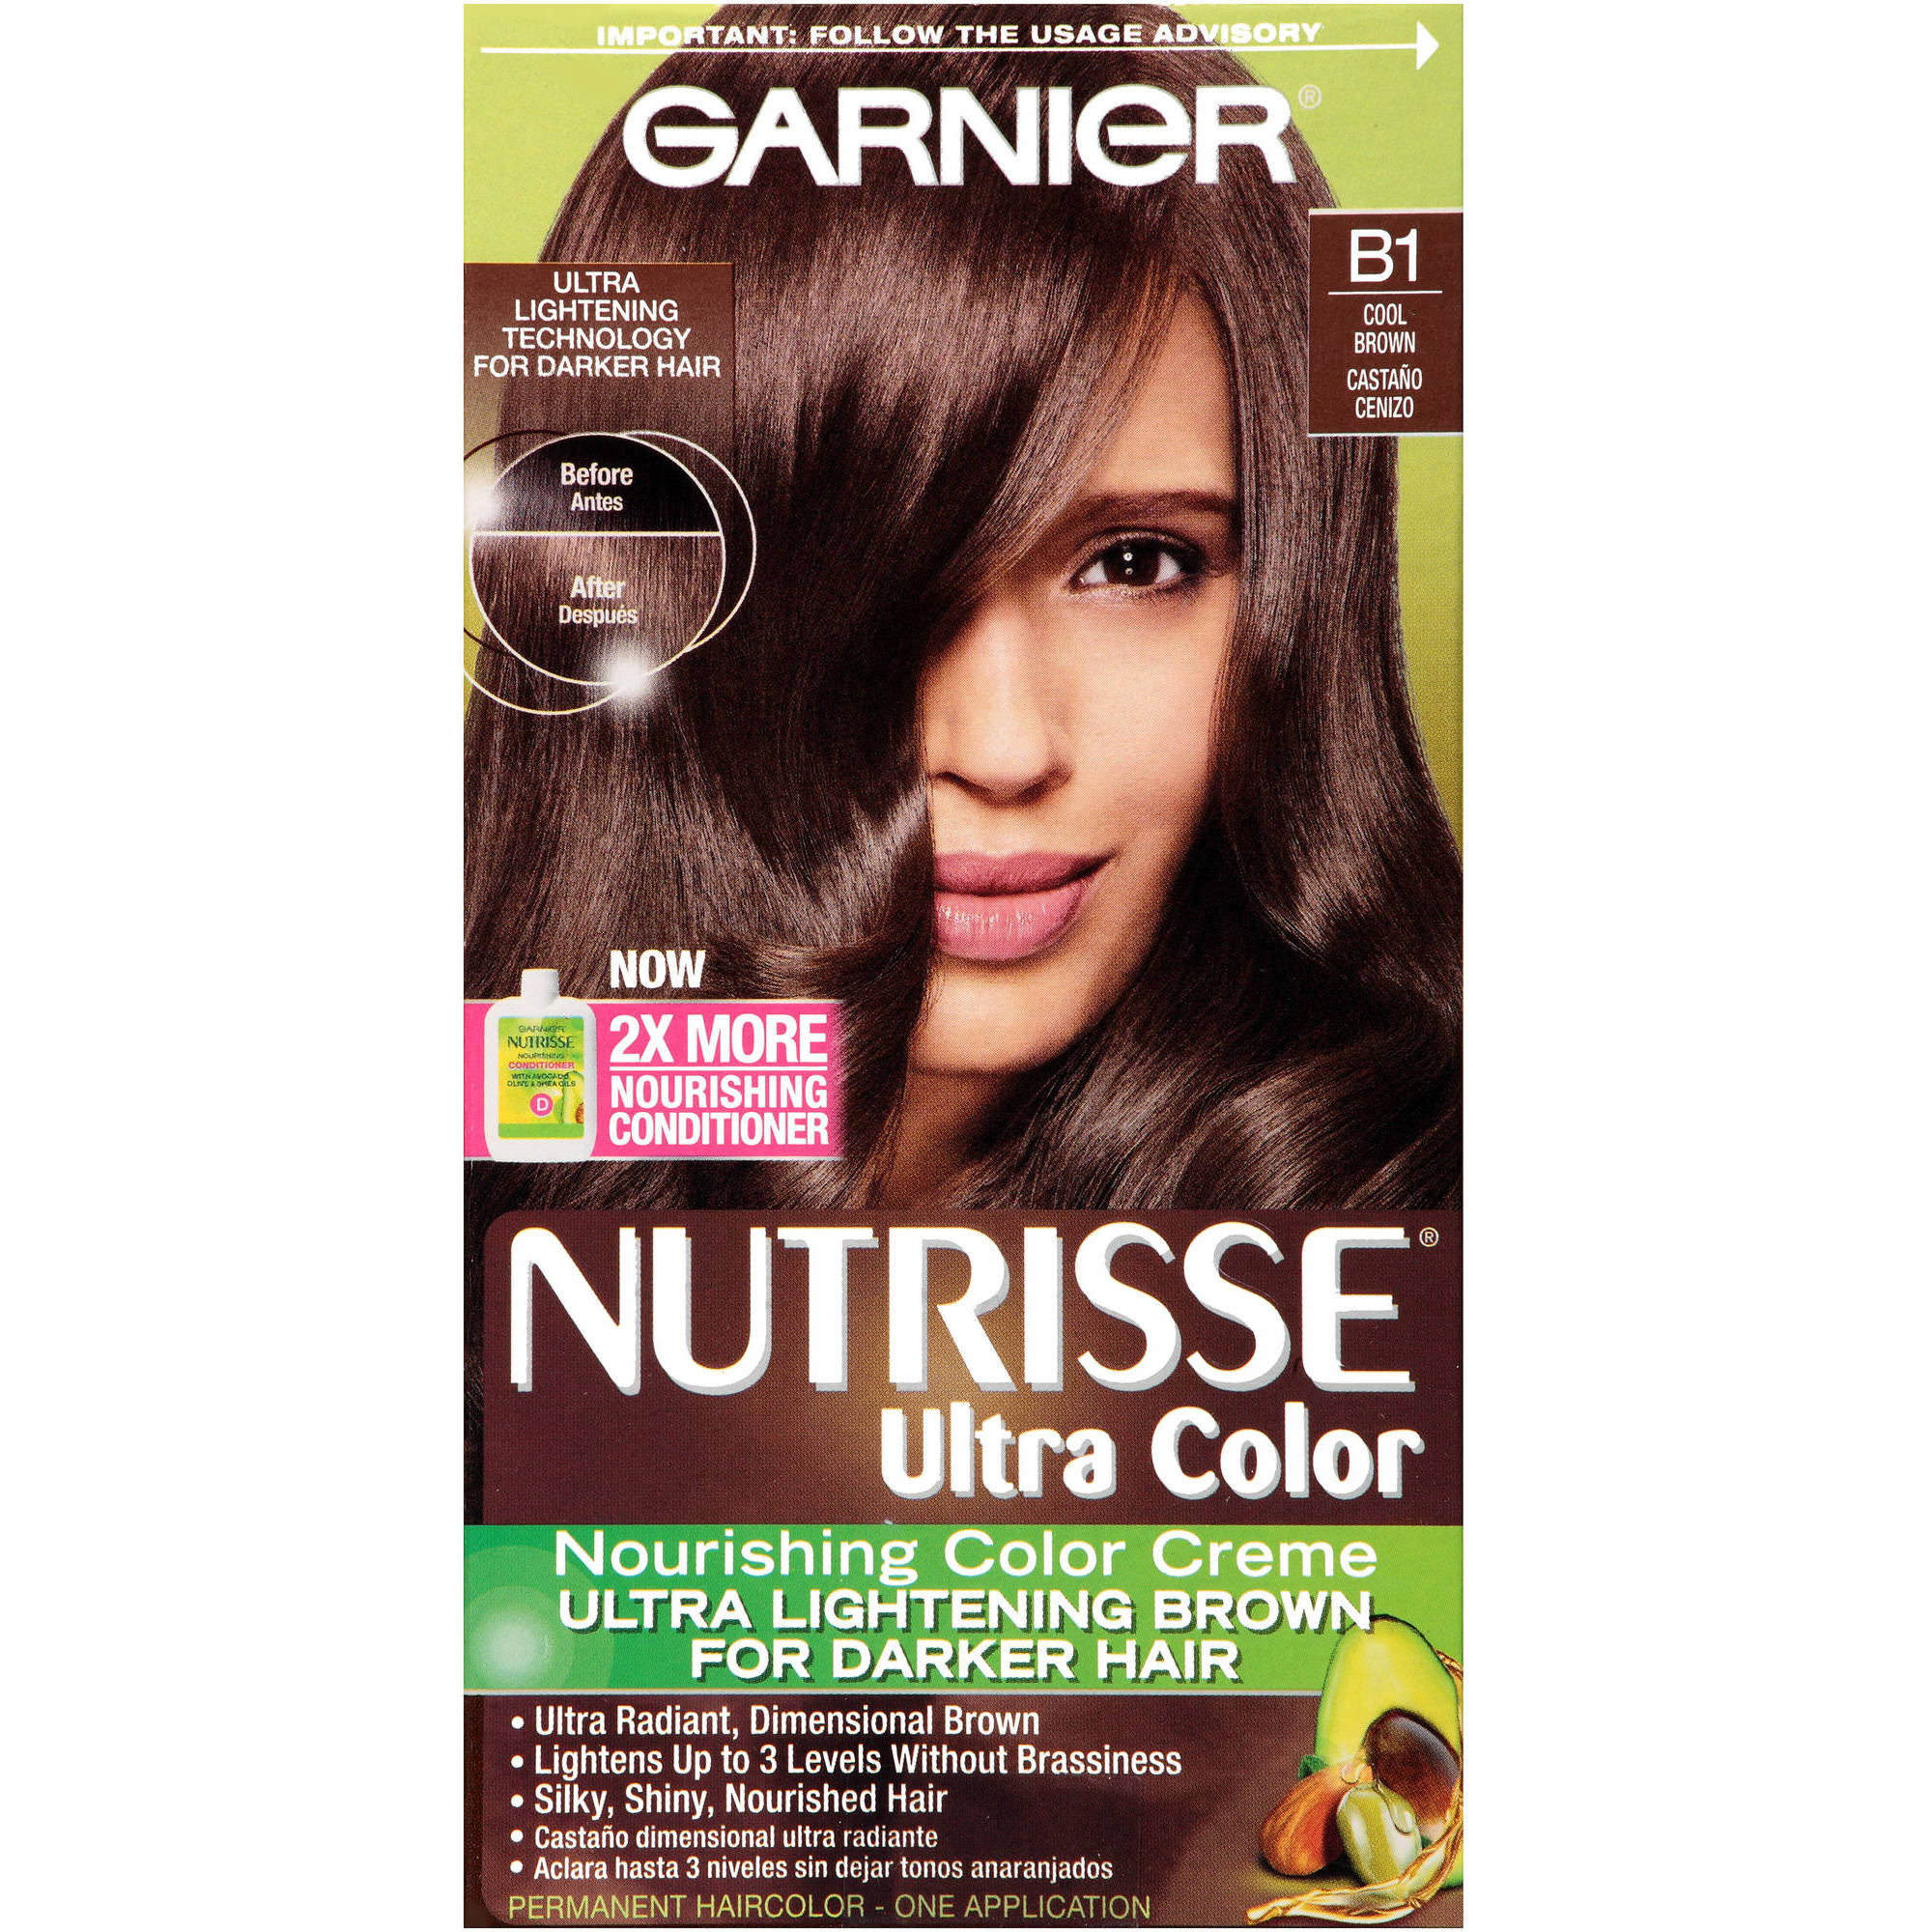 Garnier Nutrisse Nourishing Creme Hair Color